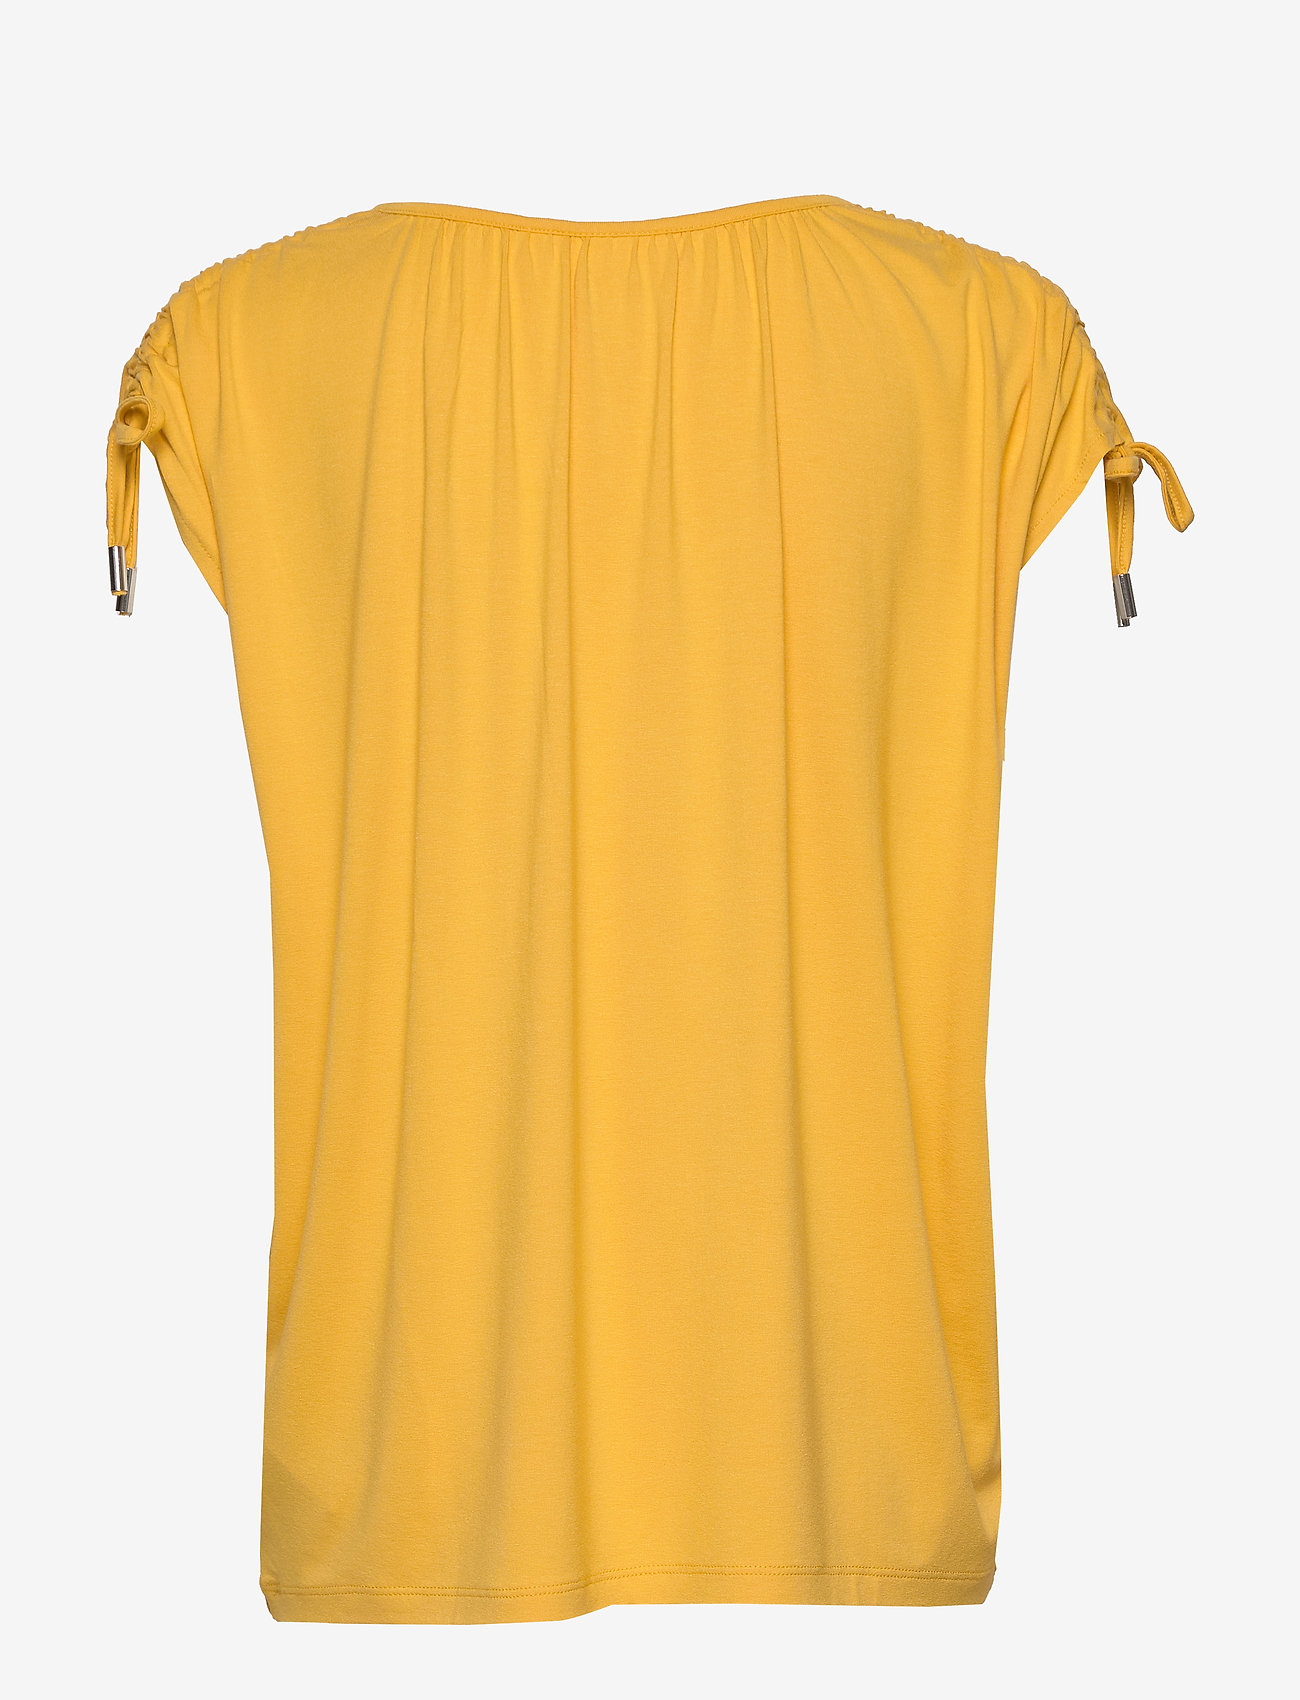 Inwear Eviiw Top - Blusar & Skjortor Golden Yellow